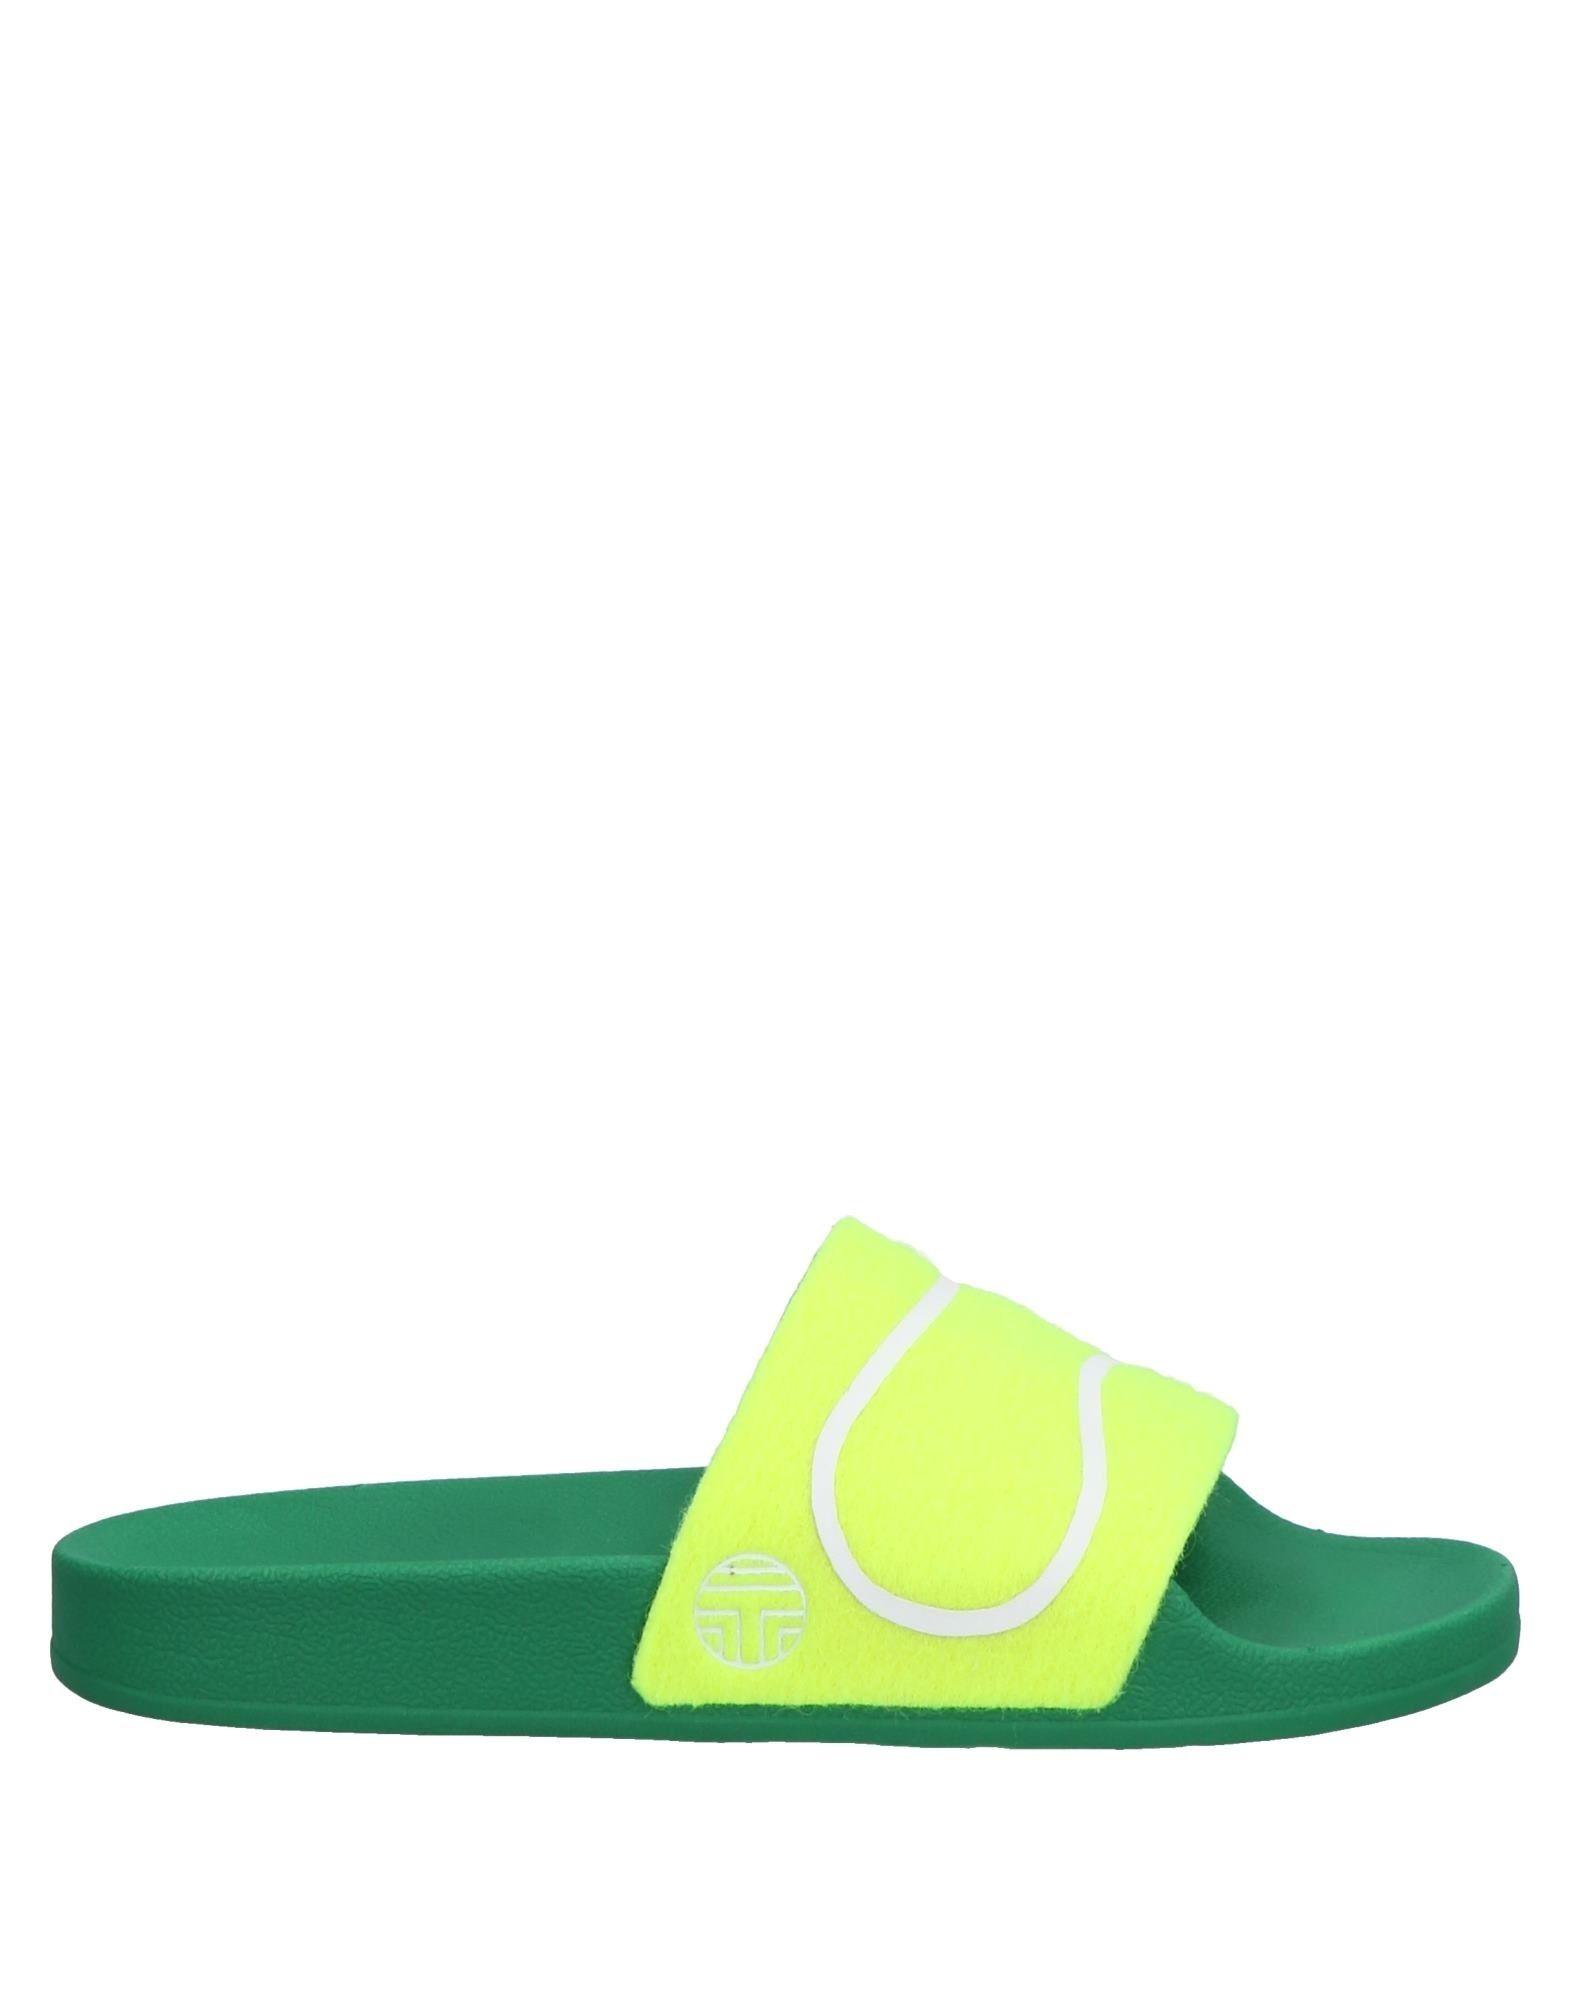 Tory Sport Sandals Sandals - Women Tory Sport Sandals Sandals online on  United Kingdom - 11575358ES a62ea5